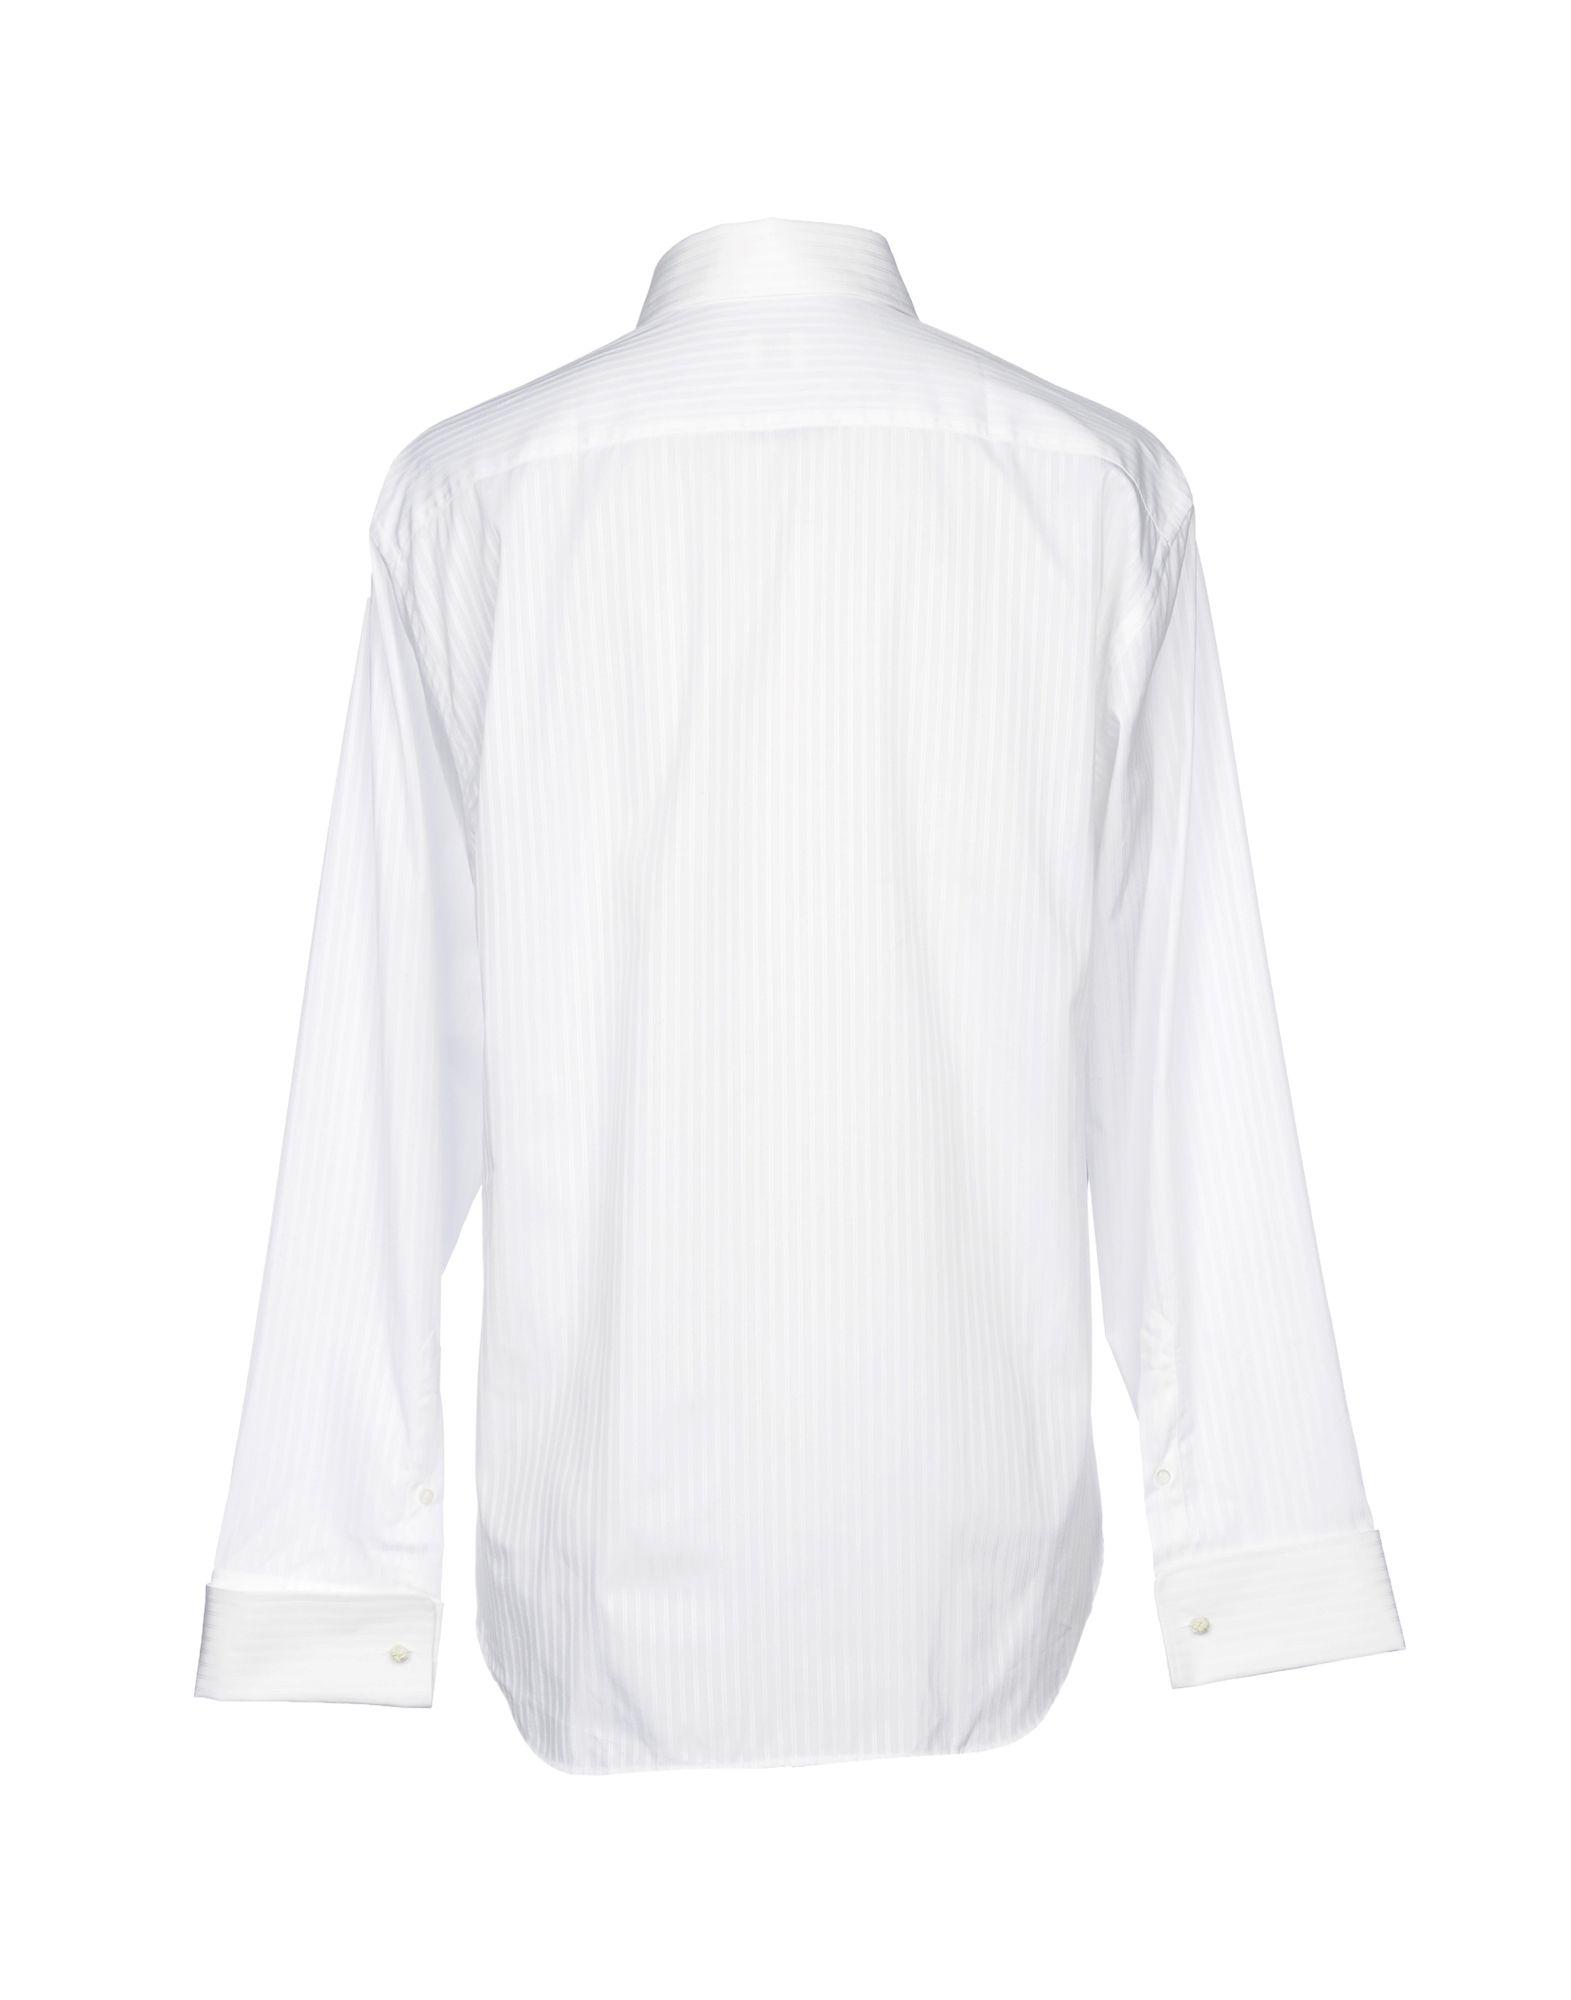 Camicia Tinta - Unita Armani Collezioni Uomo - Tinta 38759810RG b0f78a